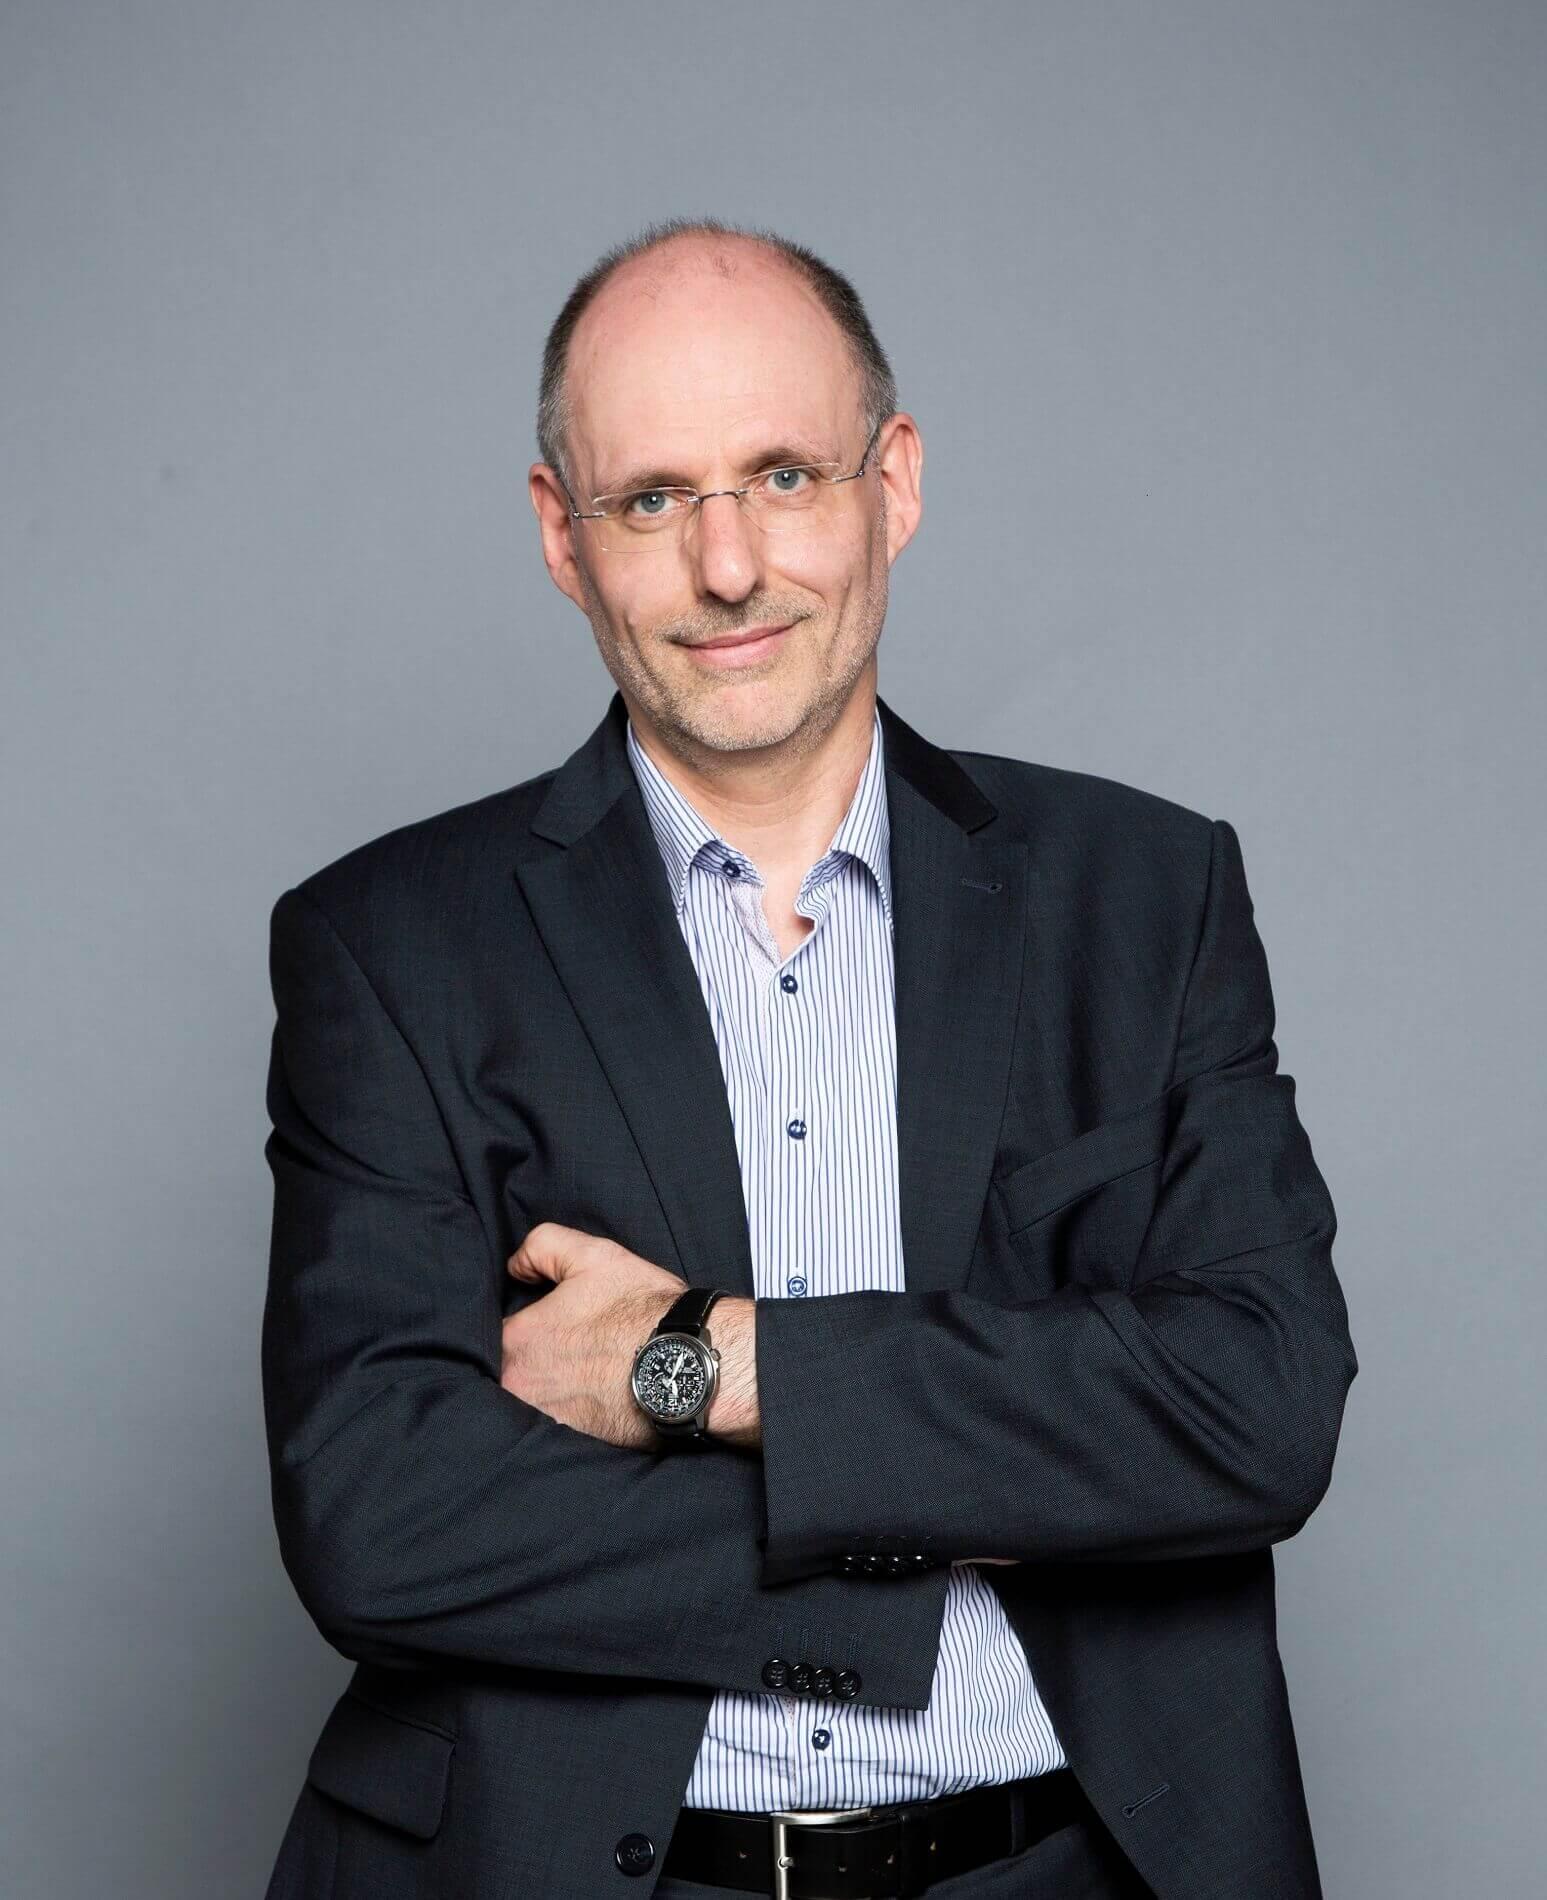 Georg Wagner, FH Joanneum